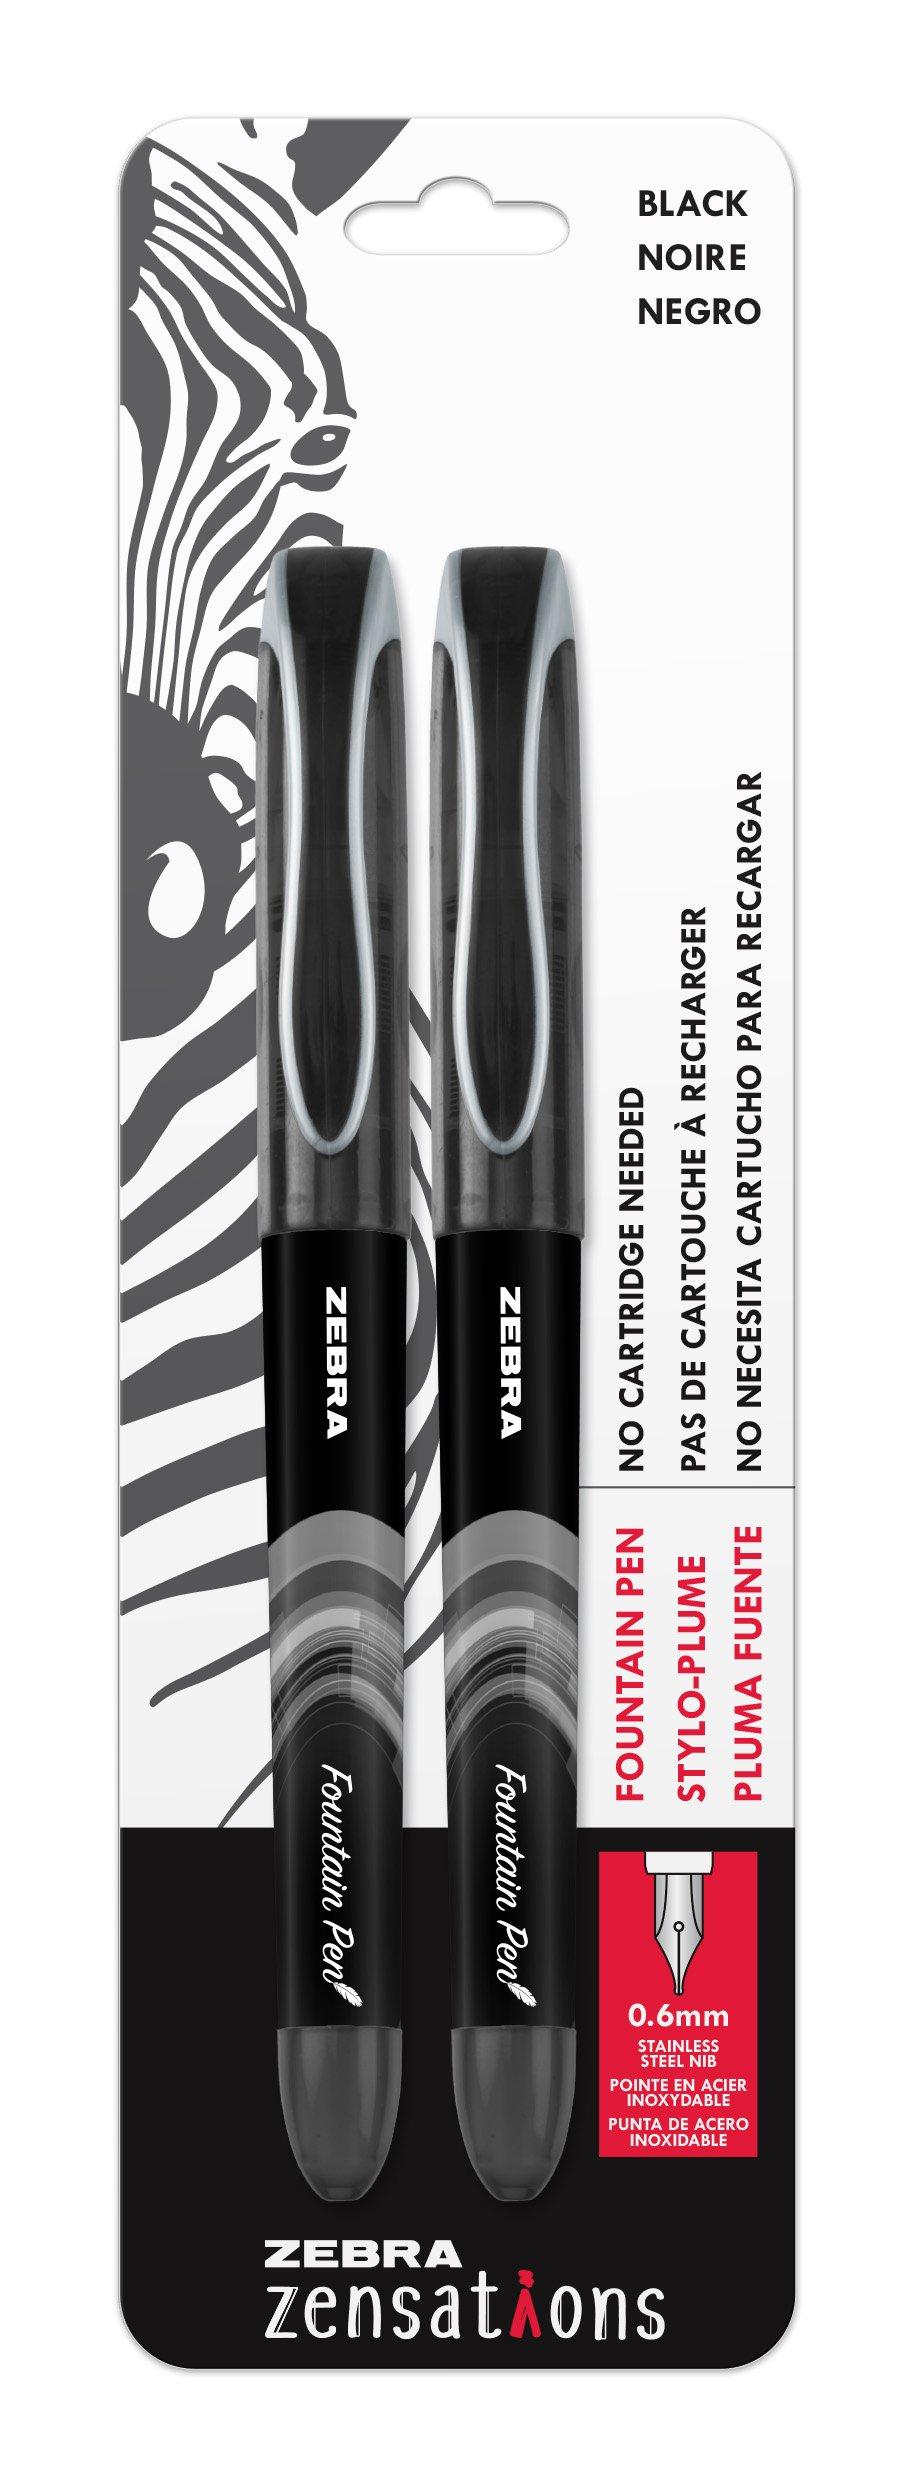 2 Lapiceras Estilografica De 0.6mm Color Negro Marca Zebra